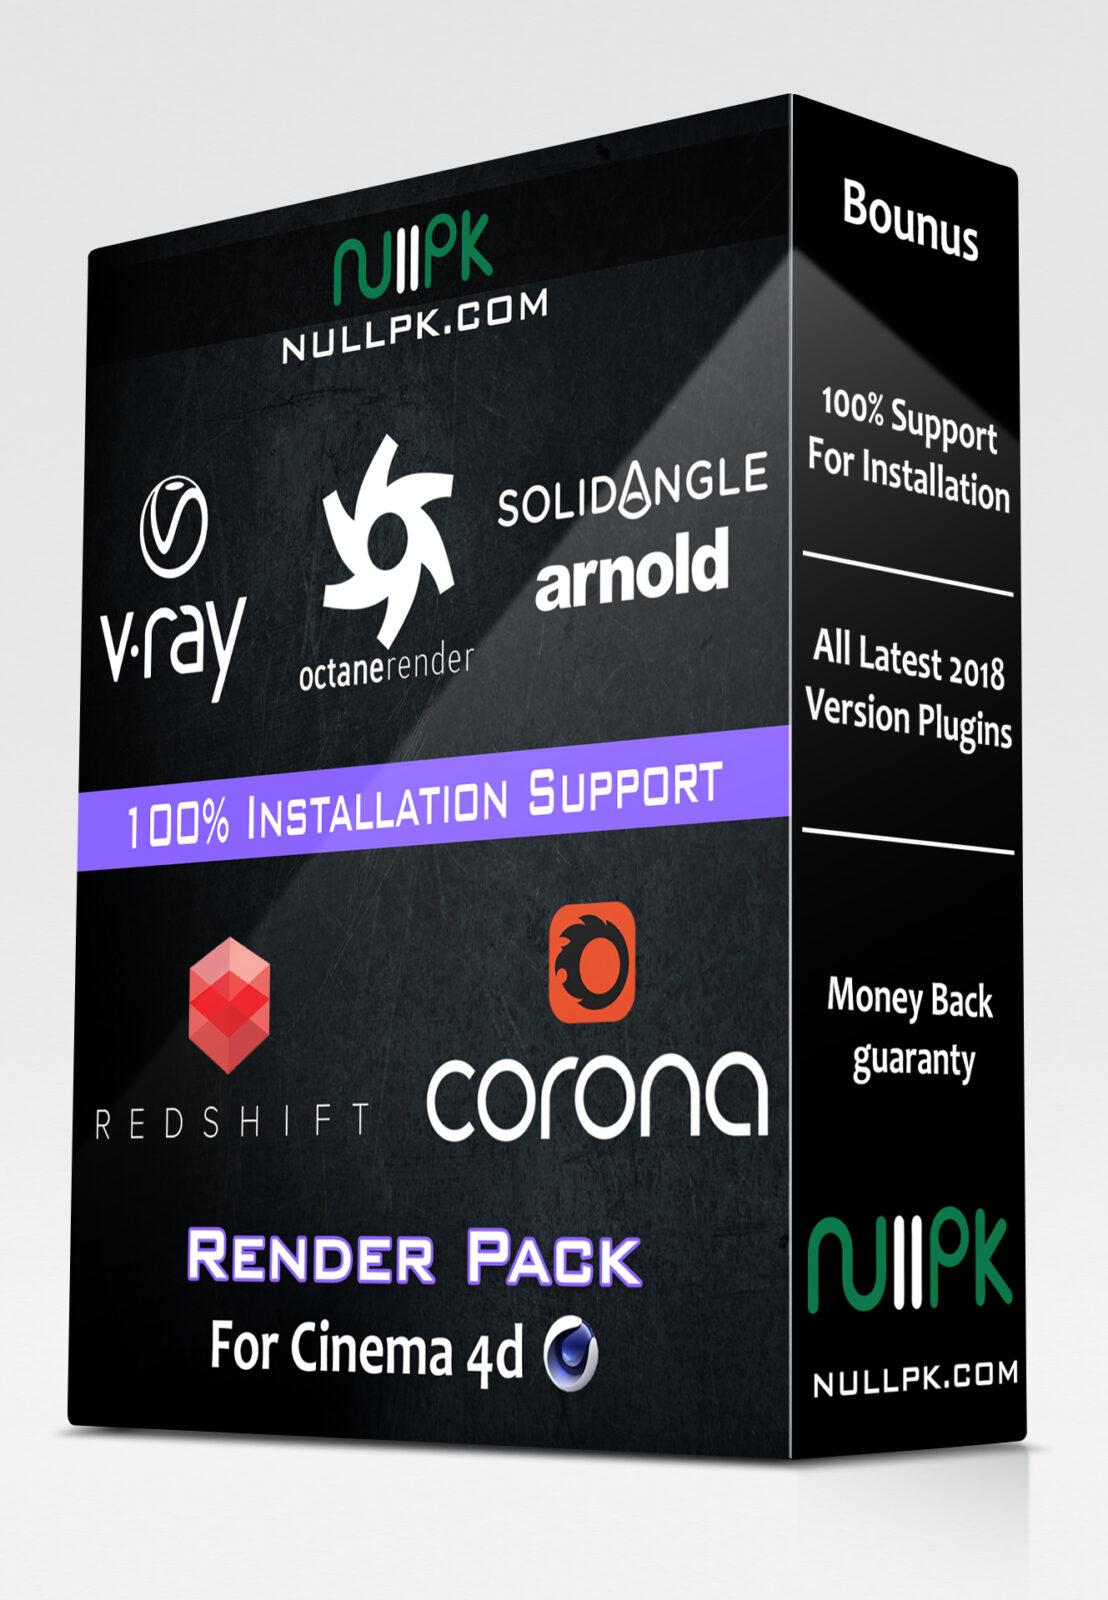 Render Pack For Cinema 4d Windows Octane / Redshift / Vray /Arnold